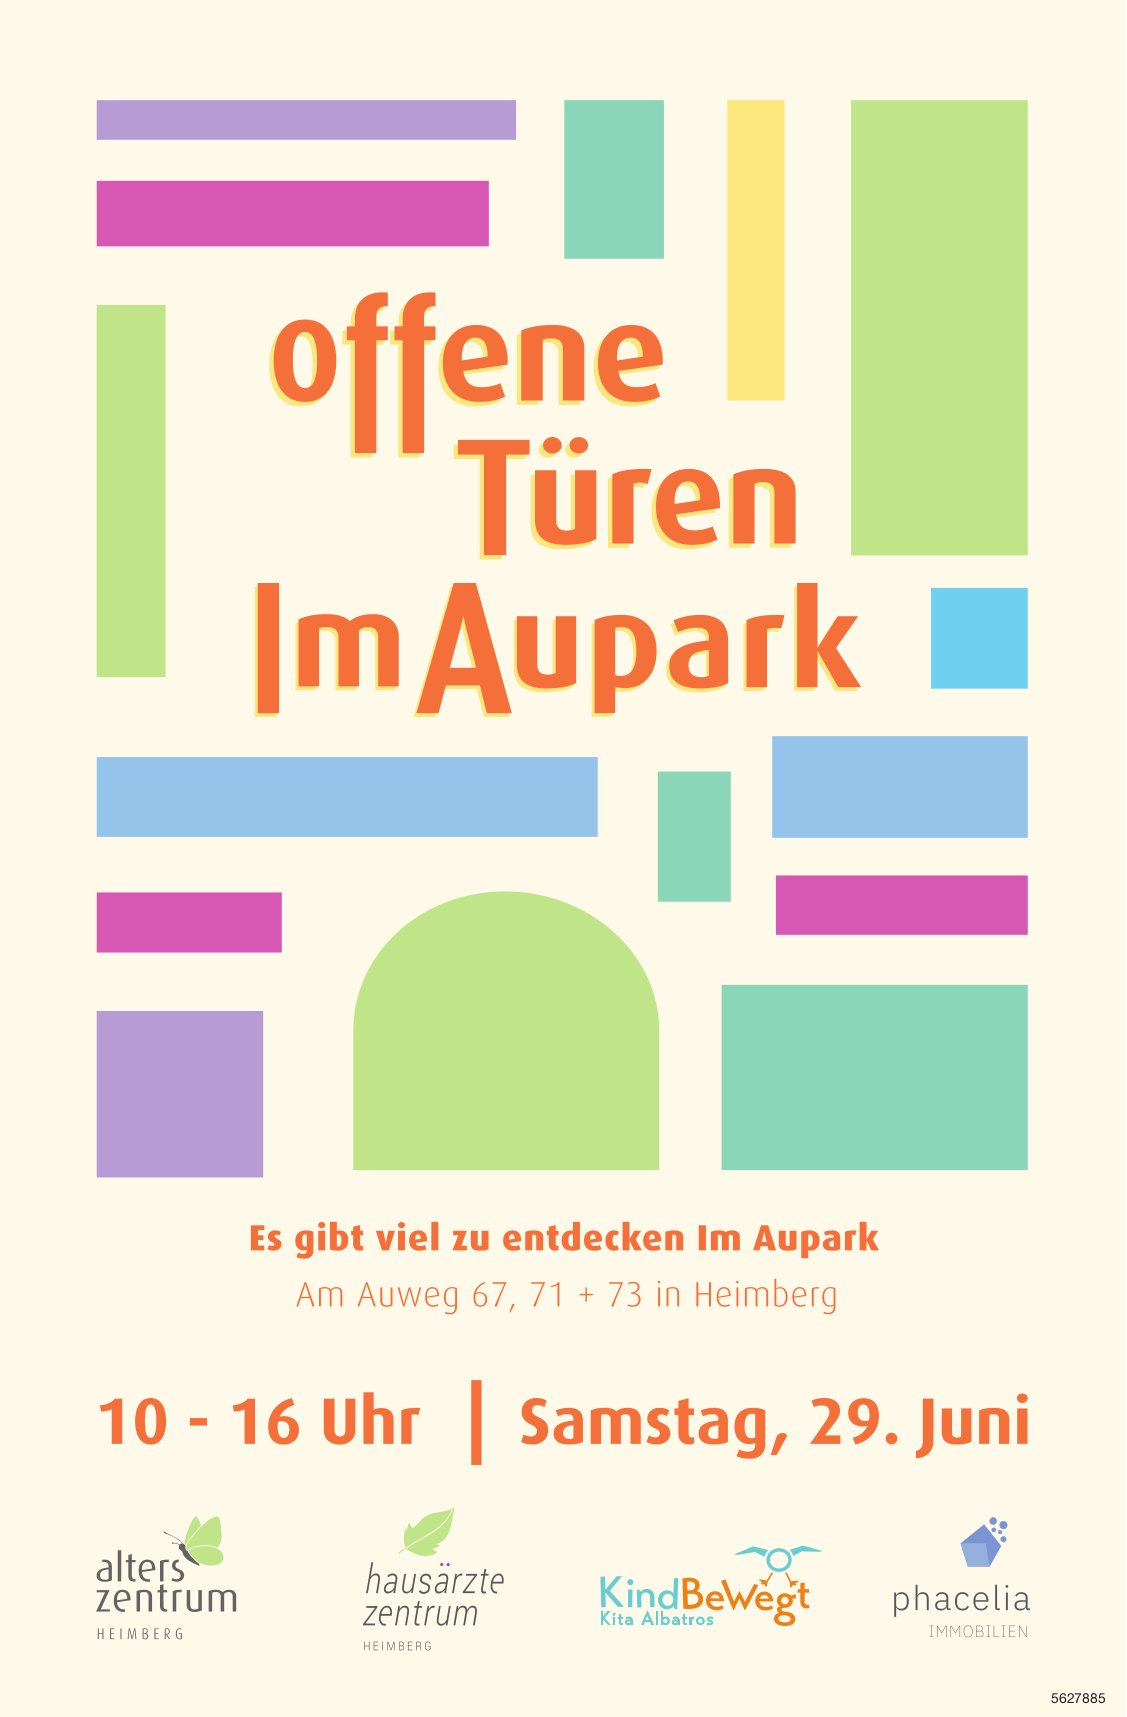 Offene Türen im Aupark am 29. Juni